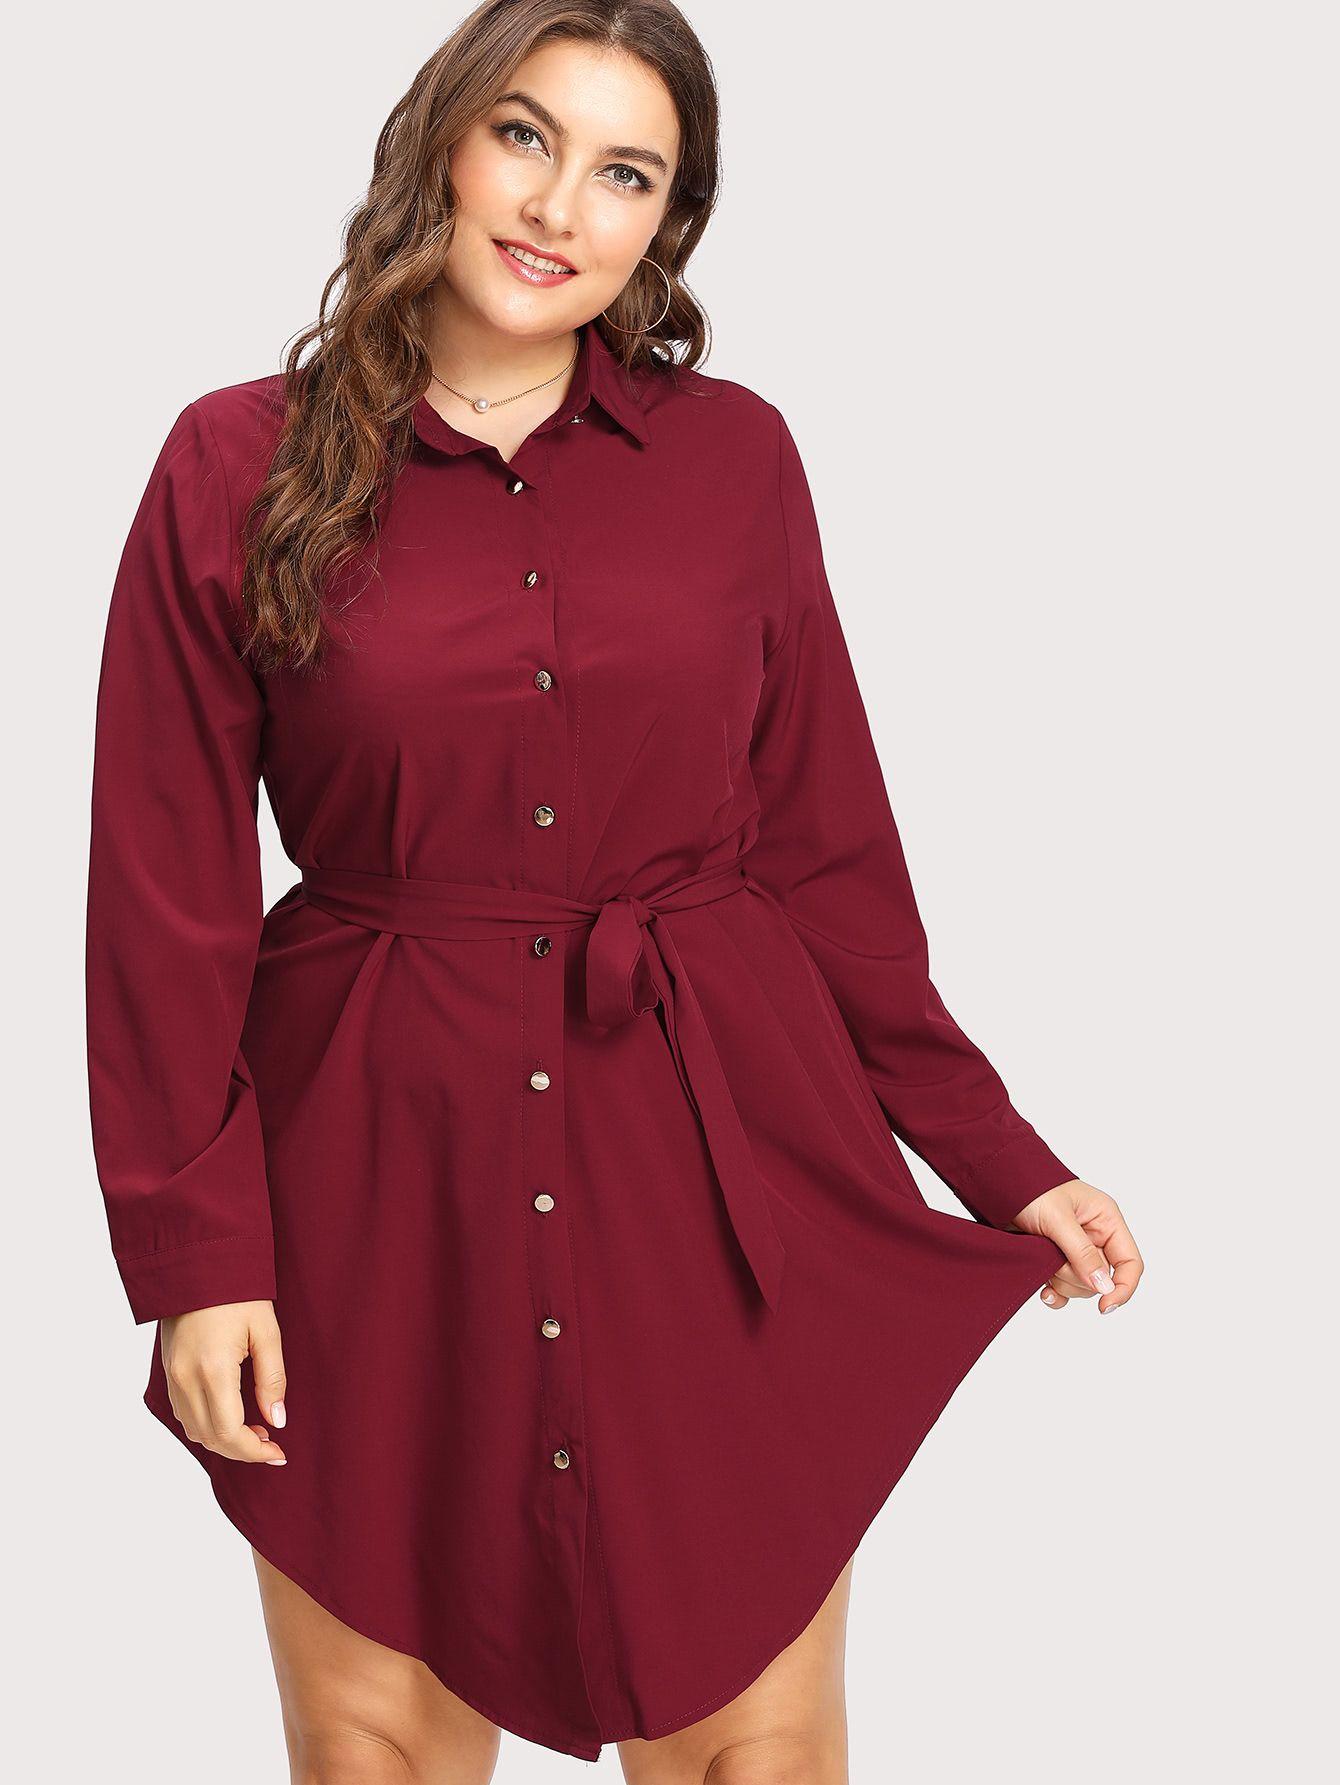 9a55e54473dde Shop Curved Hem Shirt Dress online. SheIn offers Curved Hem Shirt Dress    more to fit your fashionable needs.